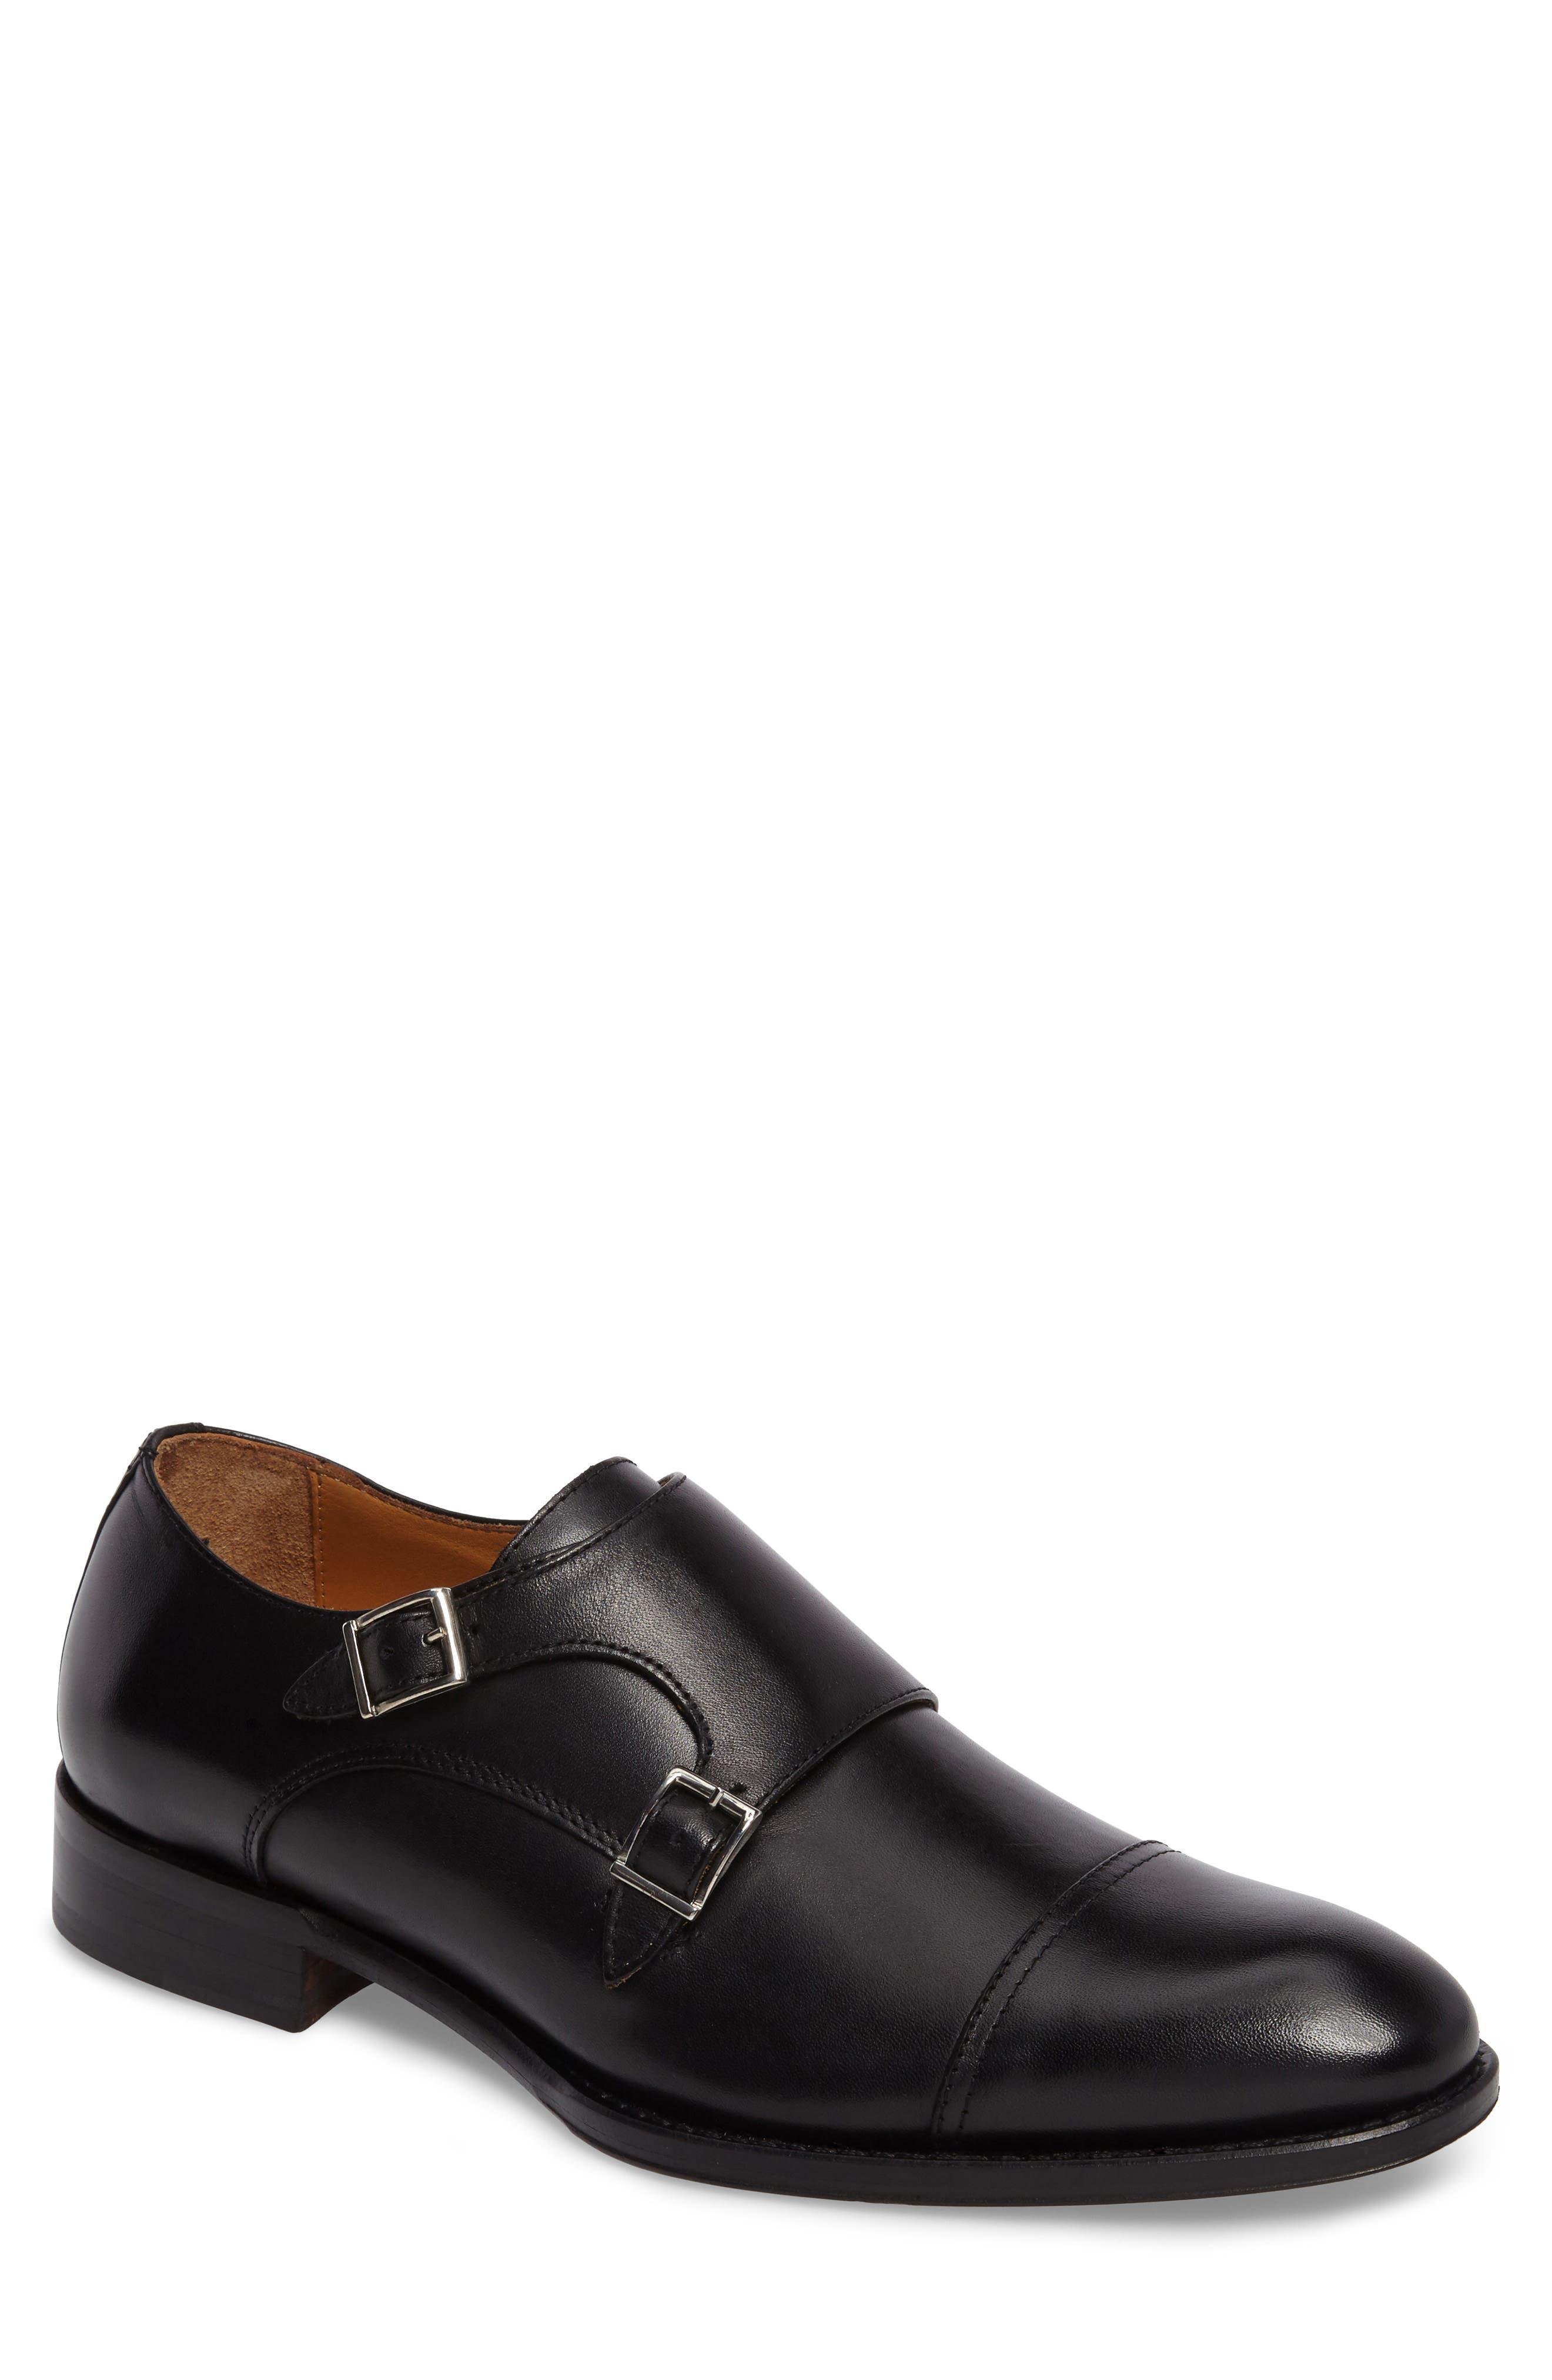 Main Image - John W. Nordstrom® Stratton Double Monk Strap Shoe (Men)